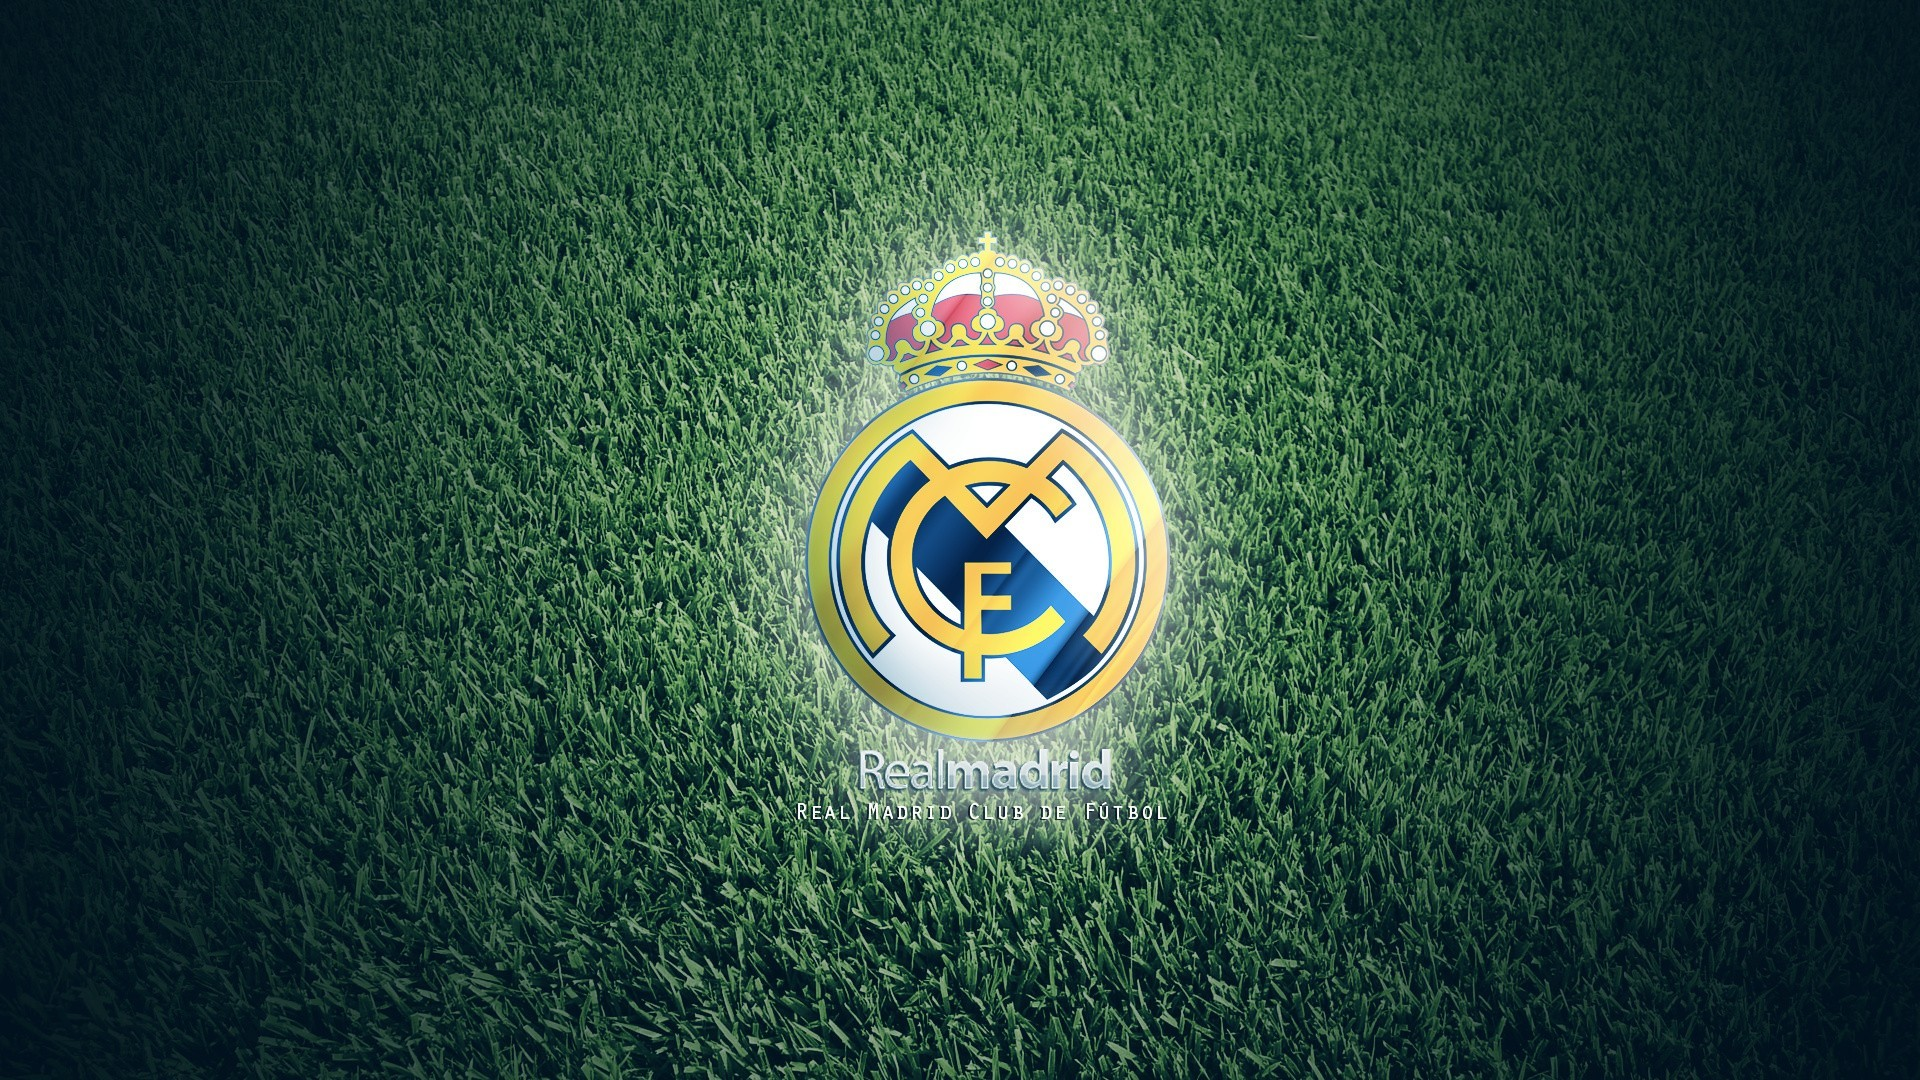 Real Madrid Wallpaper Iphone 5 #848 Wallpaper | lookwallpapers – Fond .